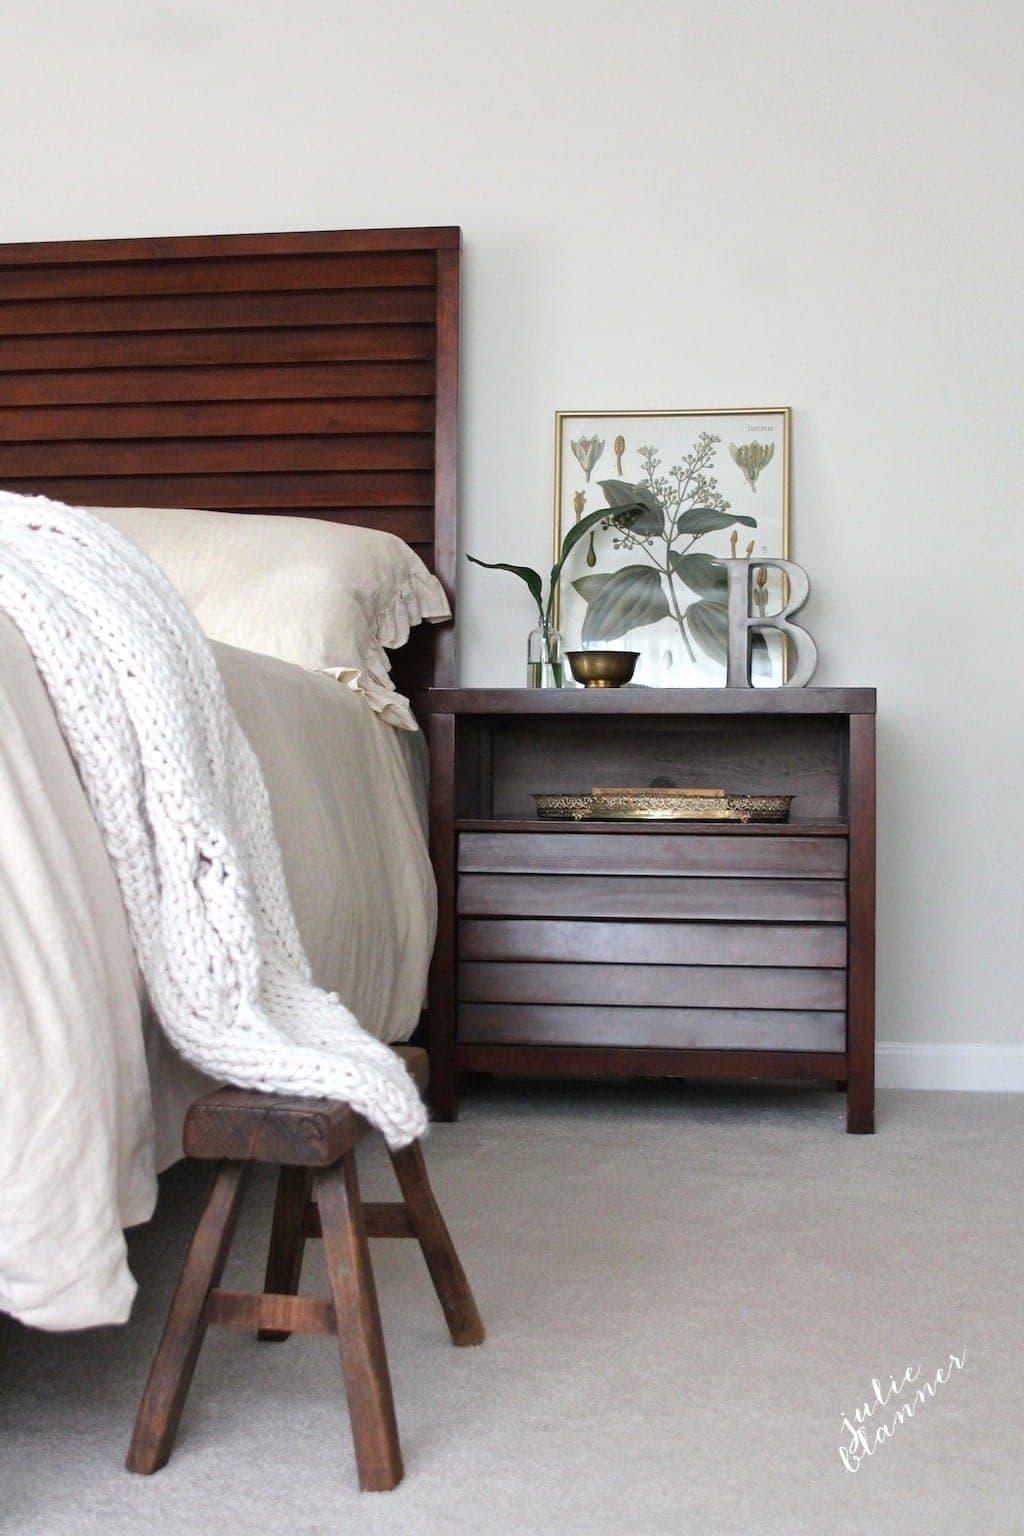 Master bedroom art & accents